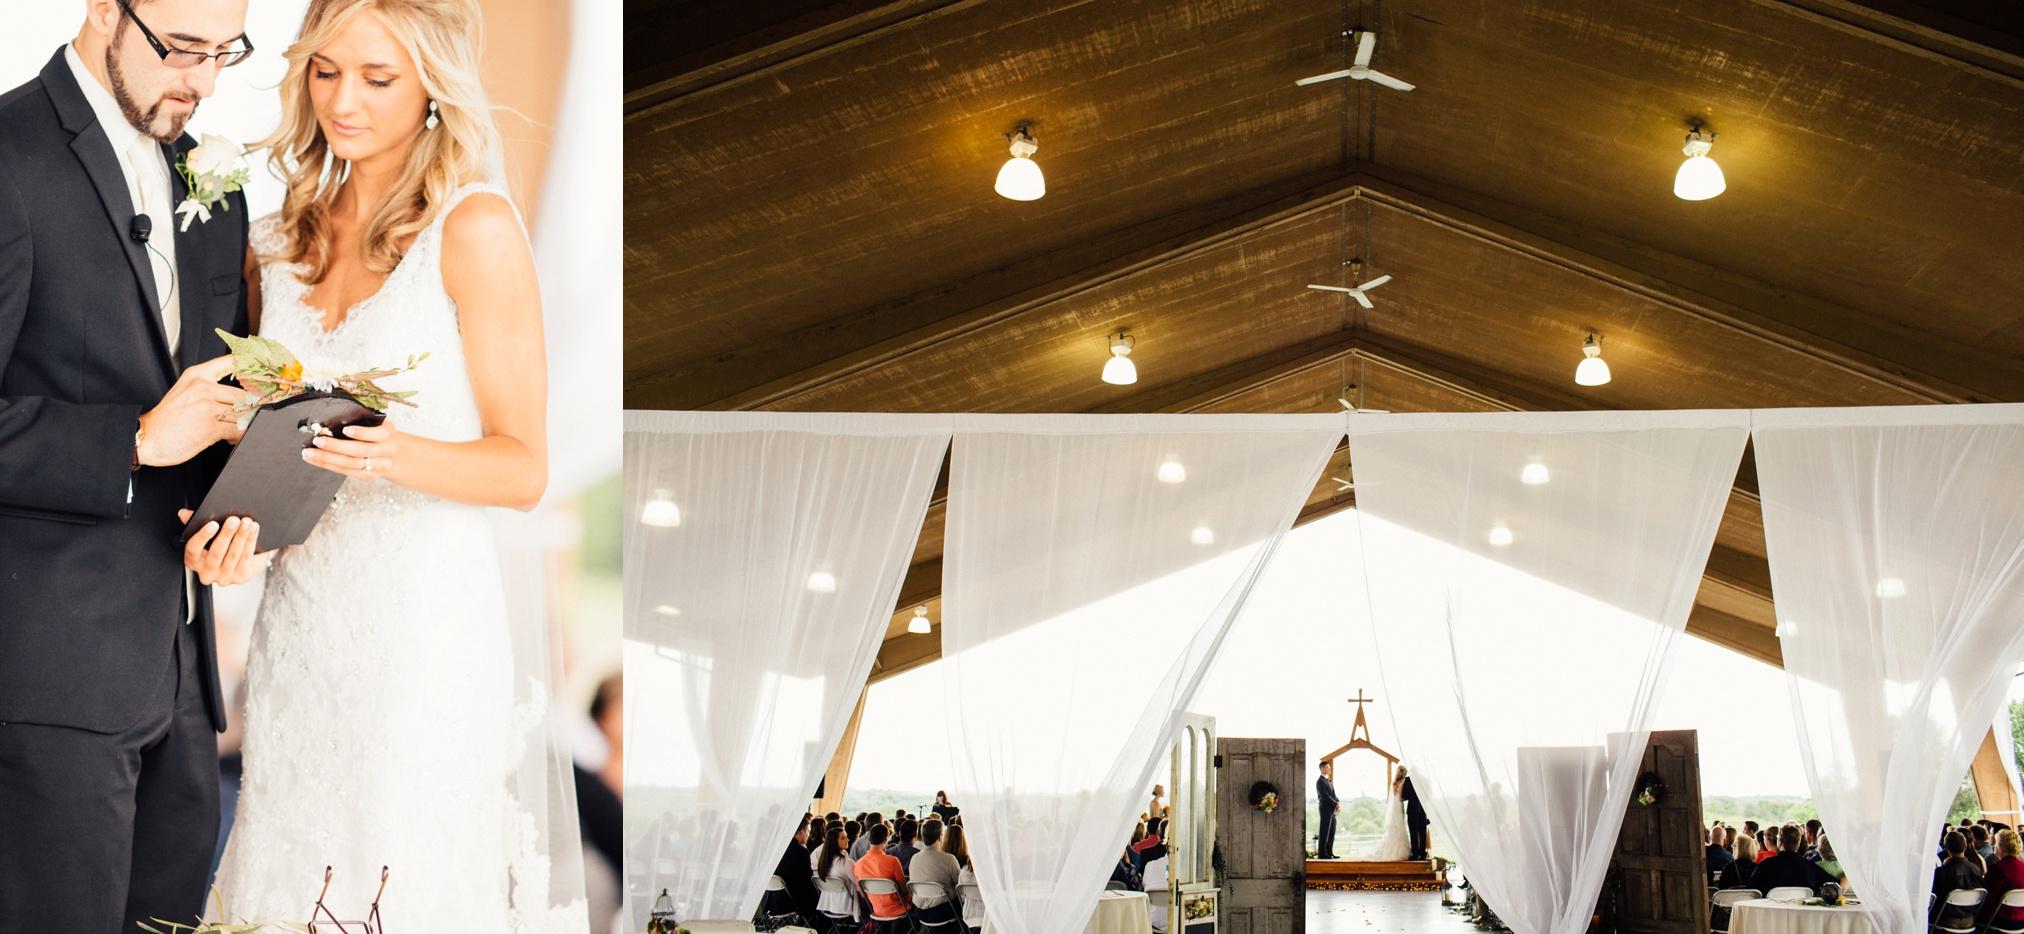 schmid_wedding-528.jpg